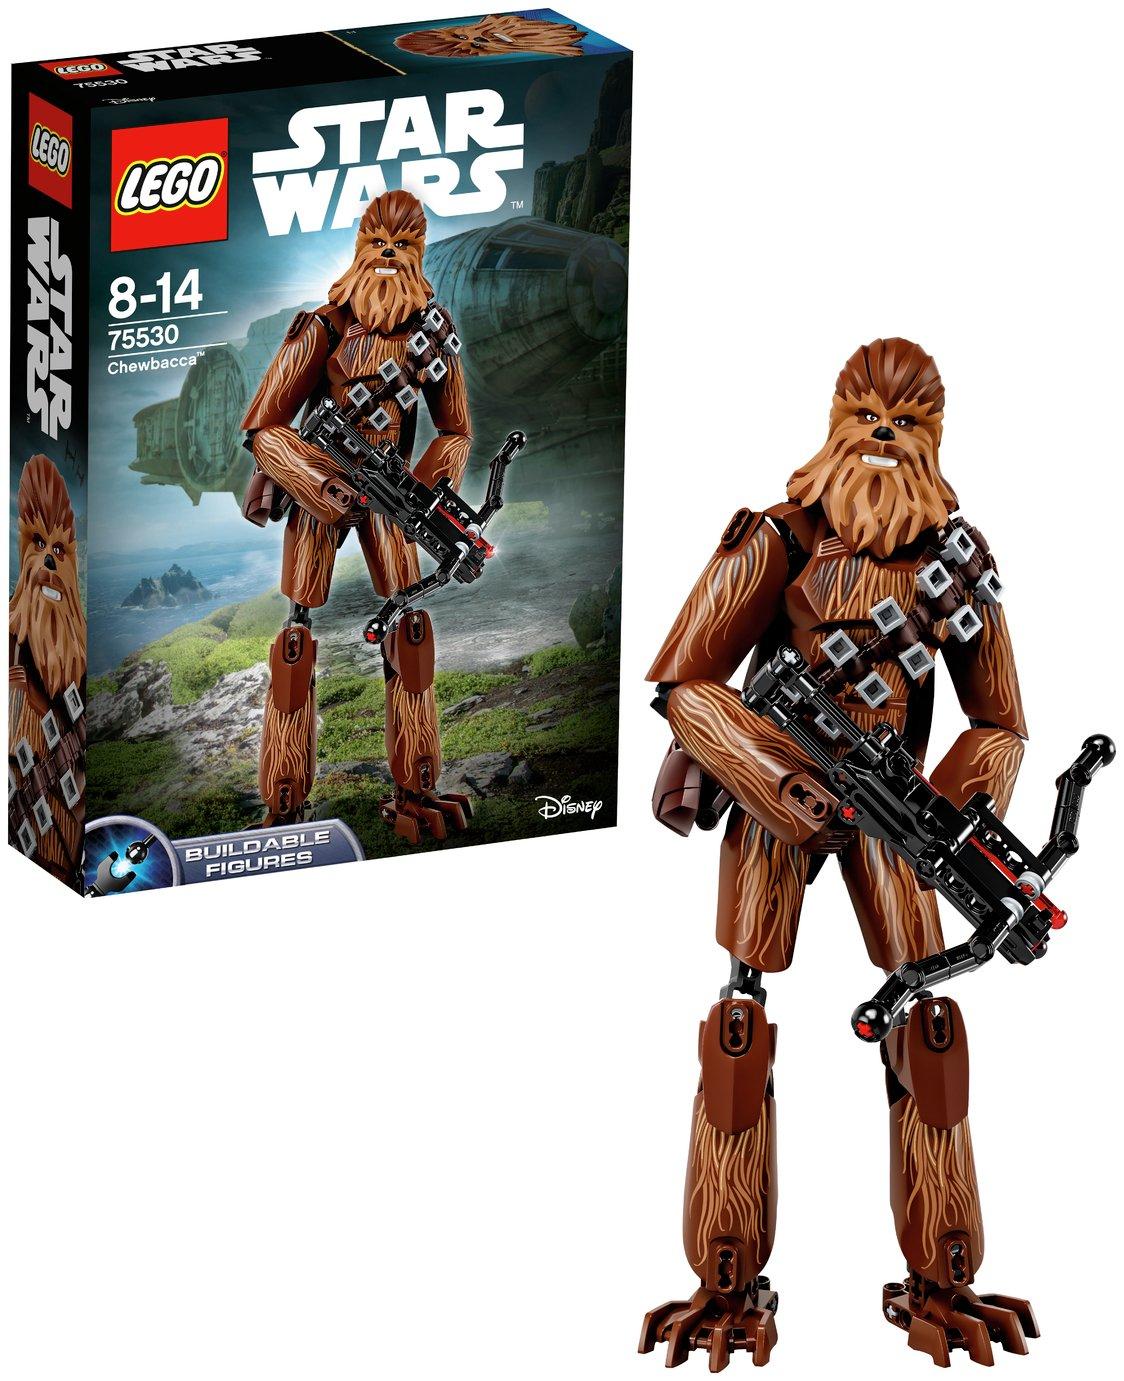 LEGO Star Wars Chewbacca - 75530